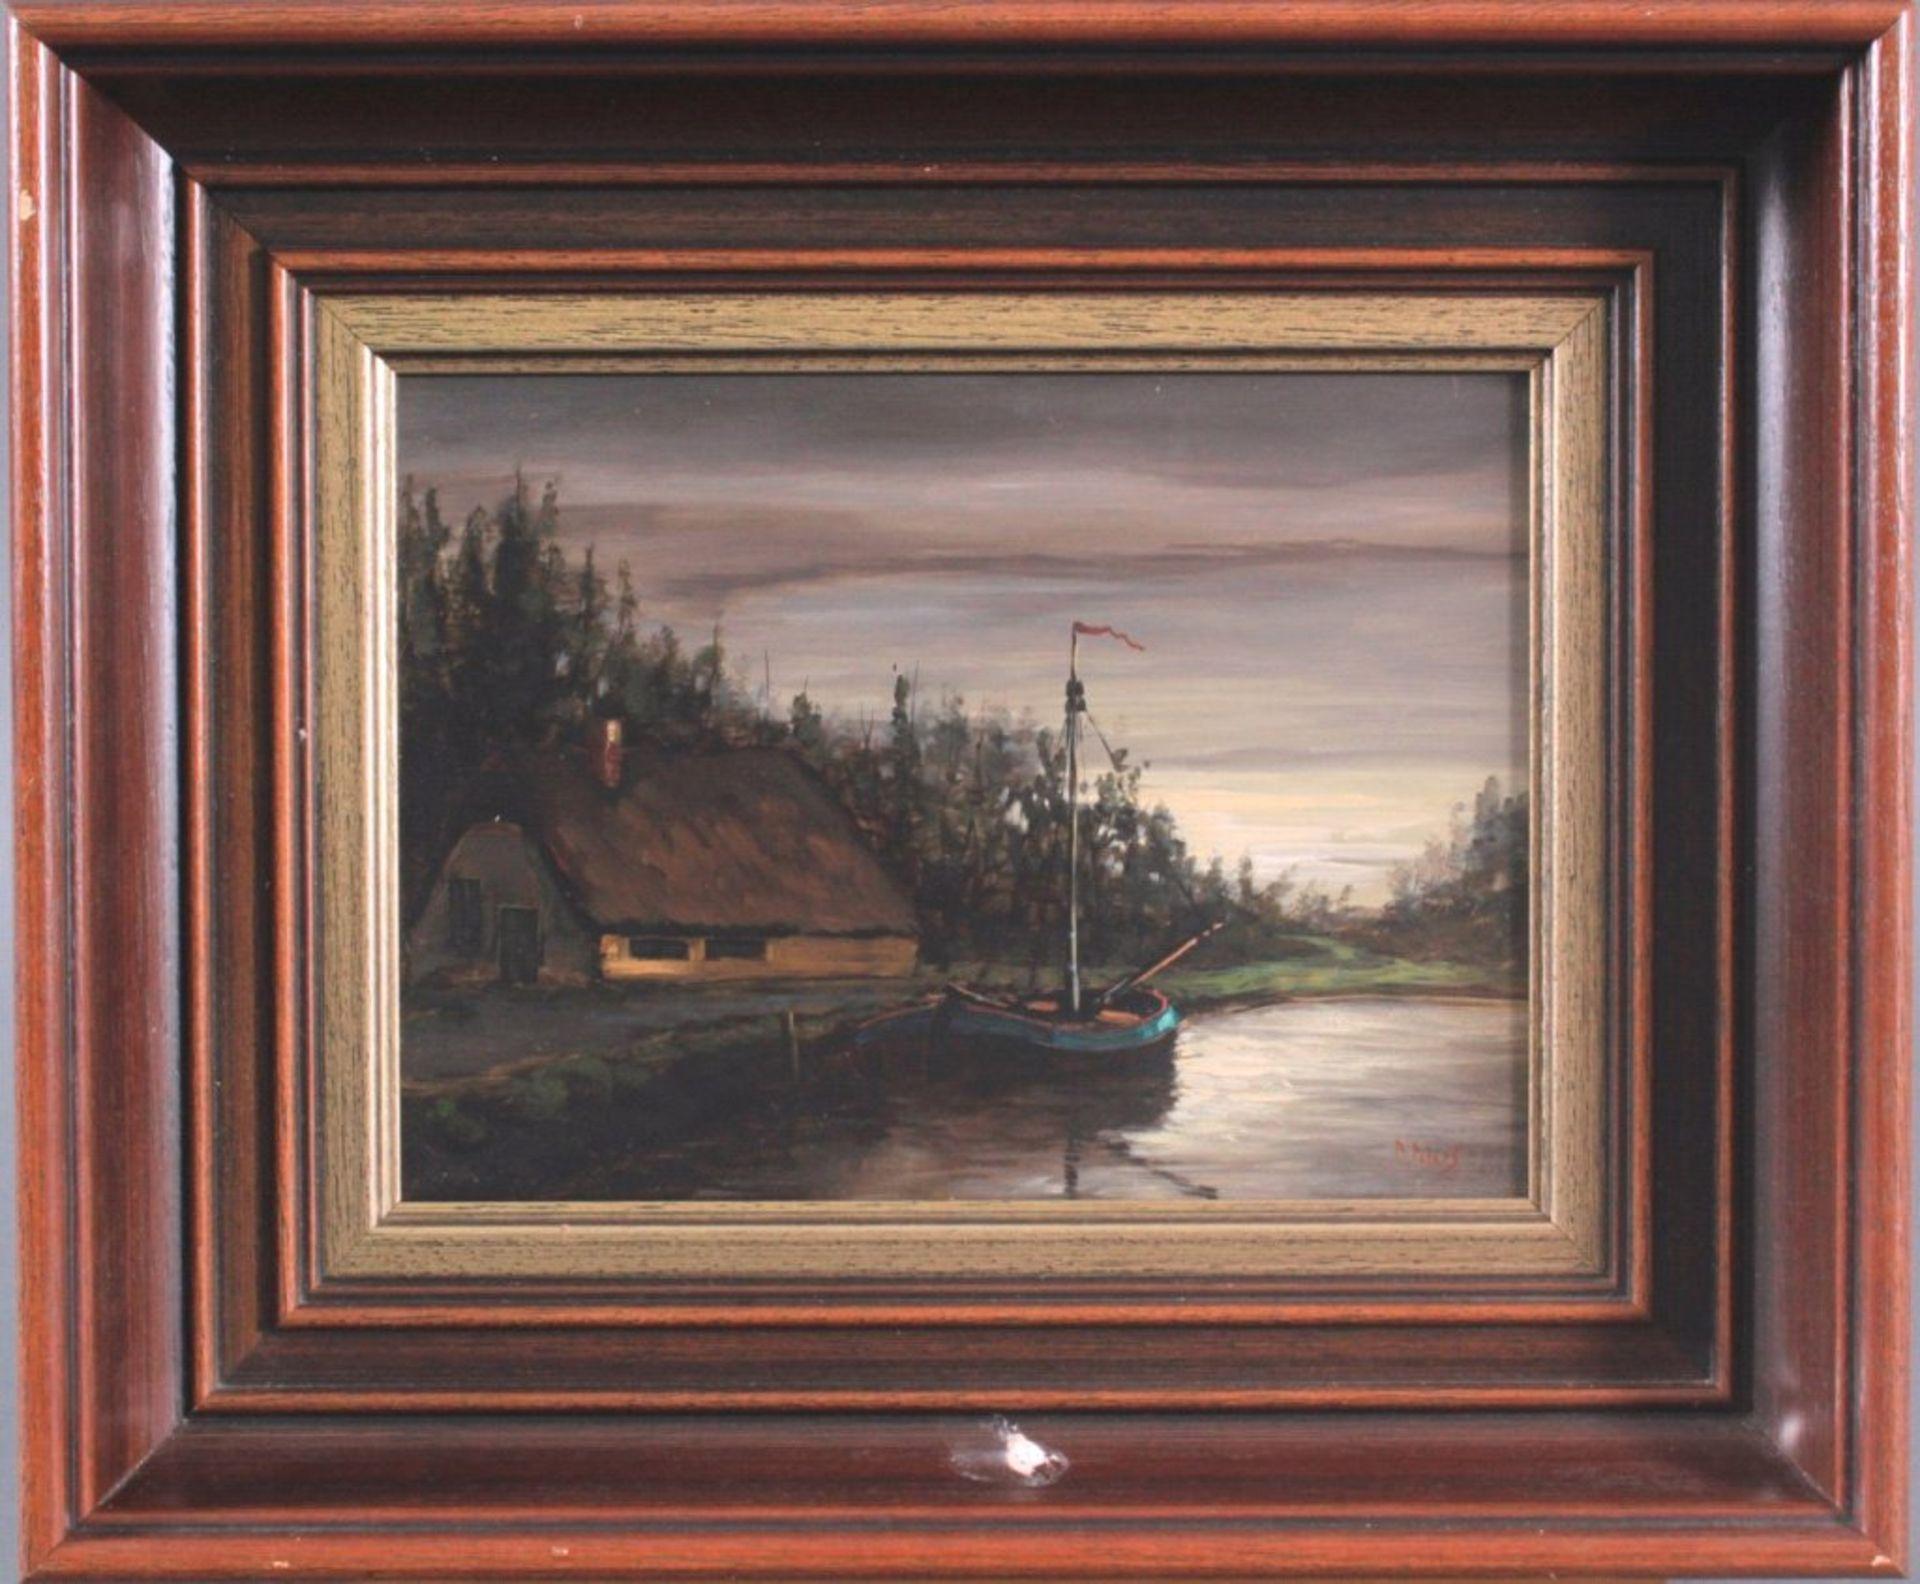 B. Peters ?-?, Fischerboot mit reetgedecktem HausÖl auf Holz, unten rechts signiert, gerahmt, ca. 17